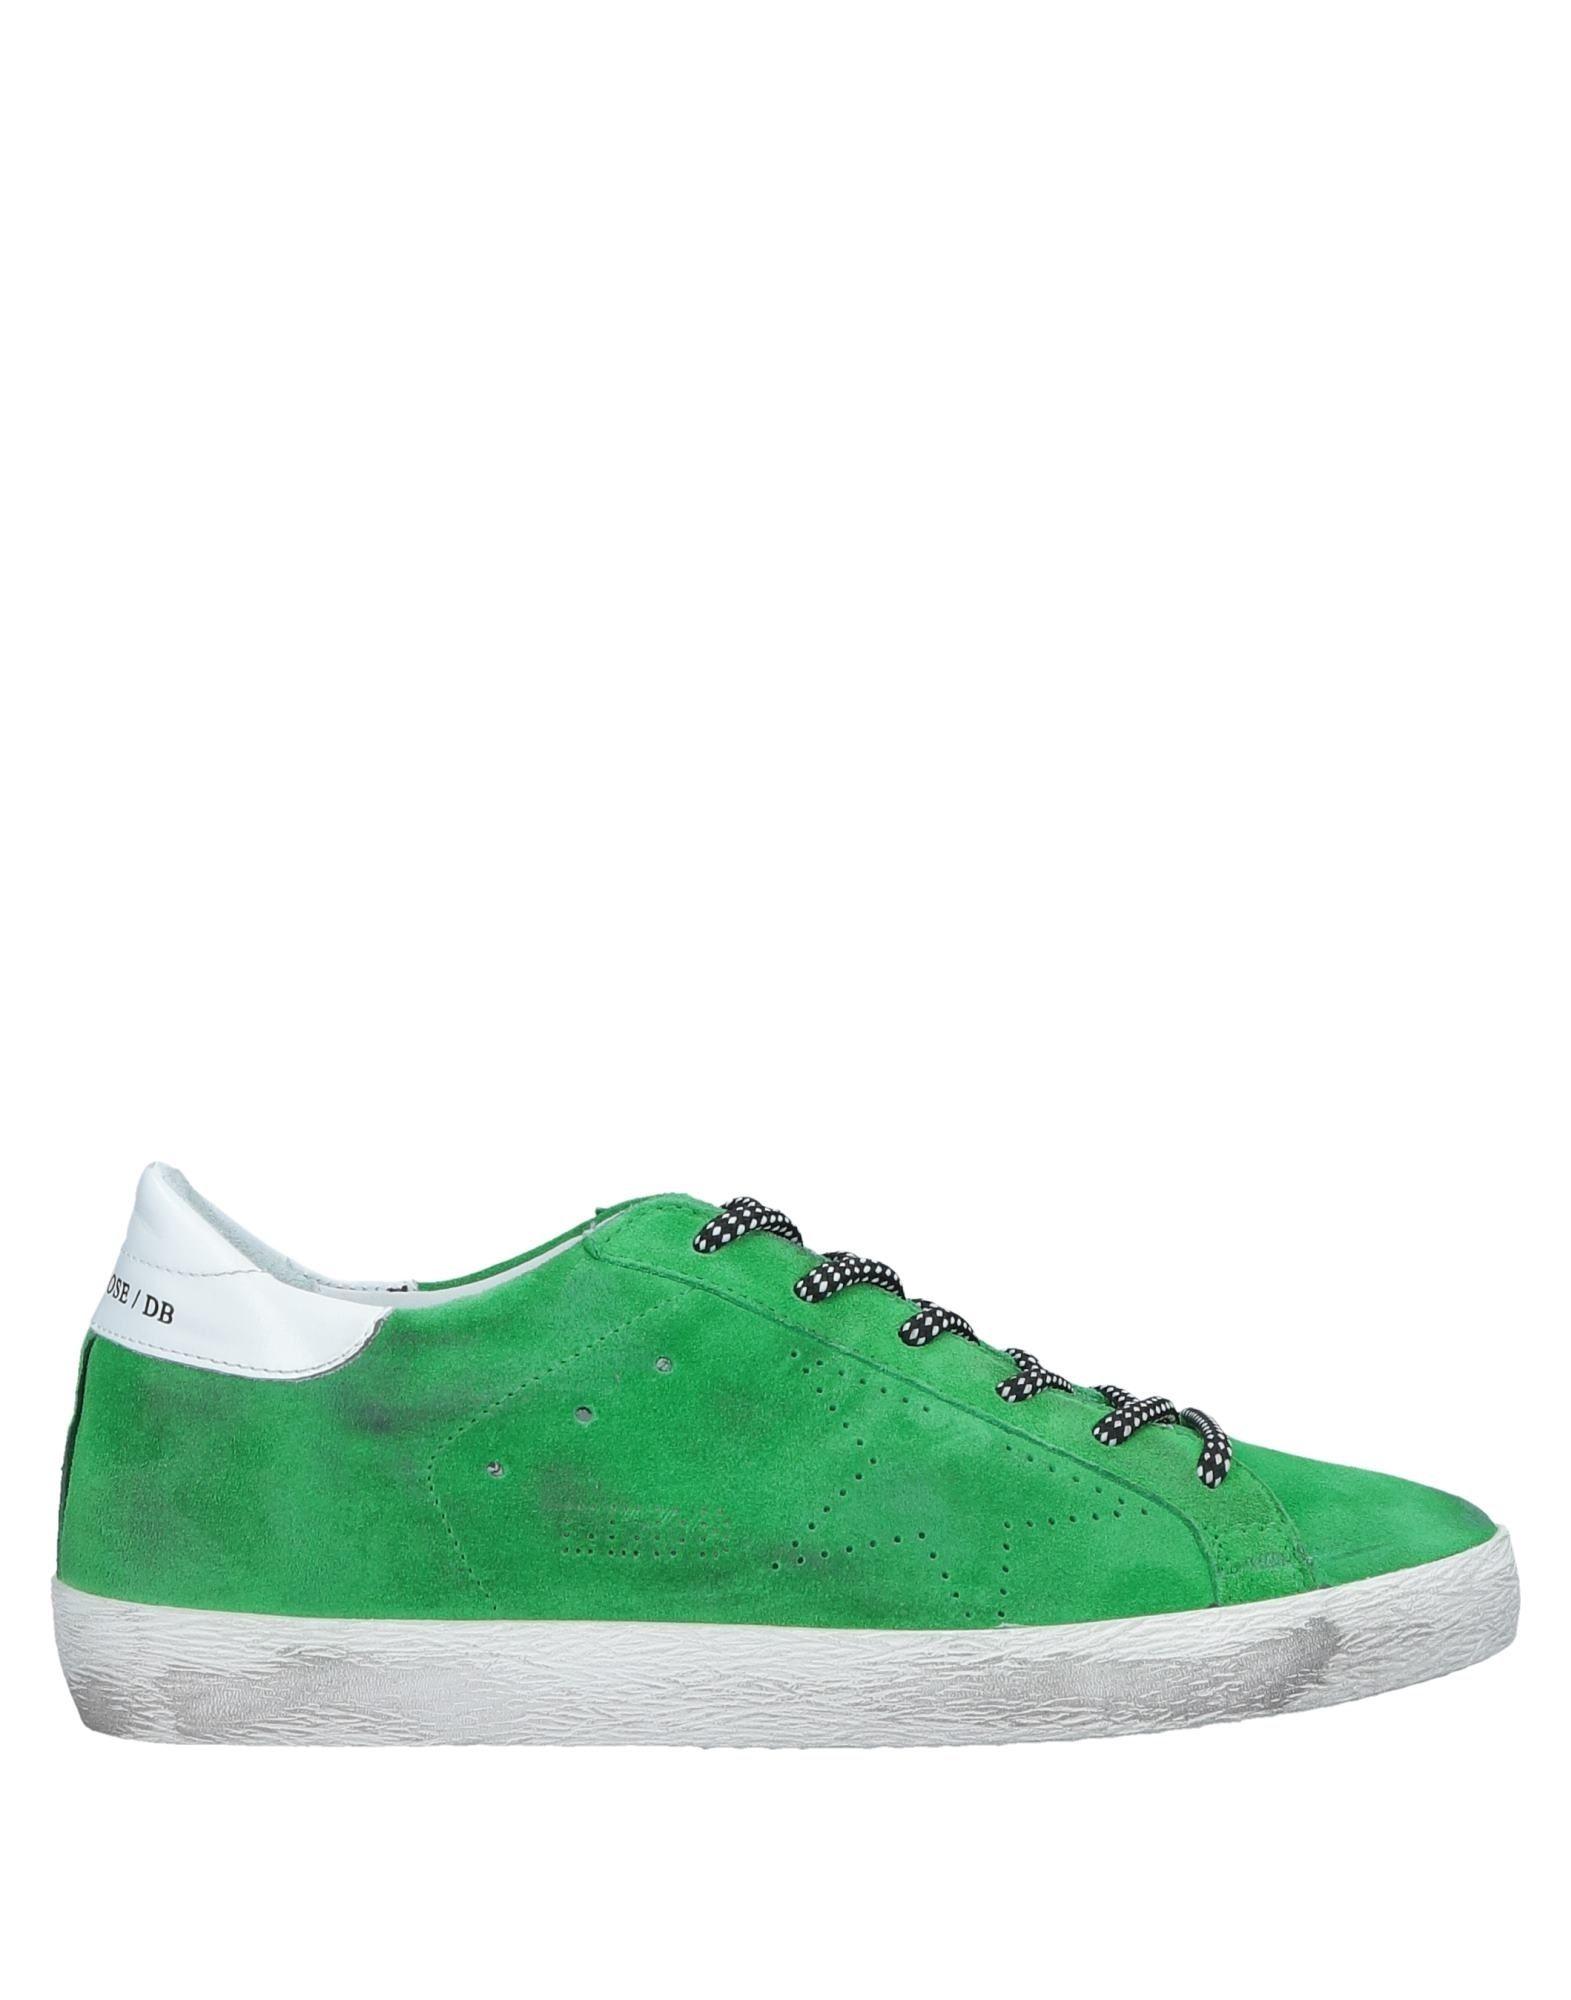 Golden Goose Deluxe Brand Sneakers Damen  11508722FBGut aussehende strapazierfähige Schuhe